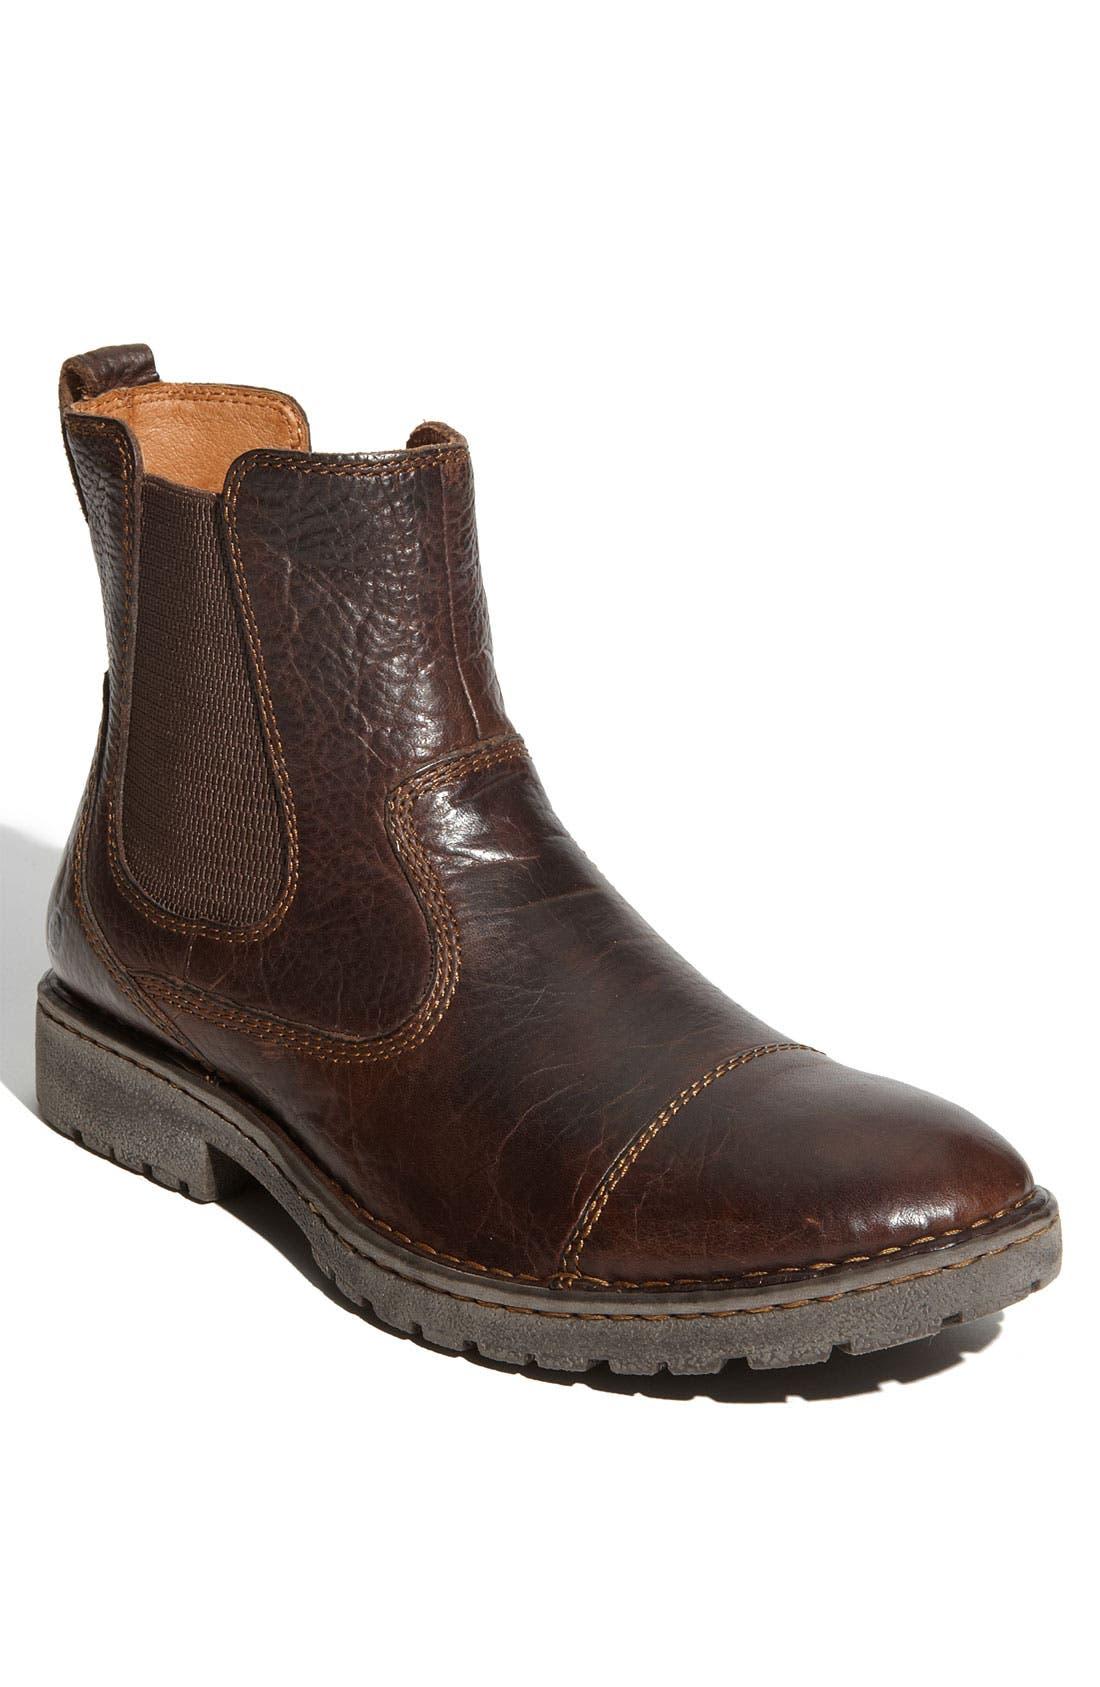 Alternate Image 1 Selected - Børn 'Jacob' Boot